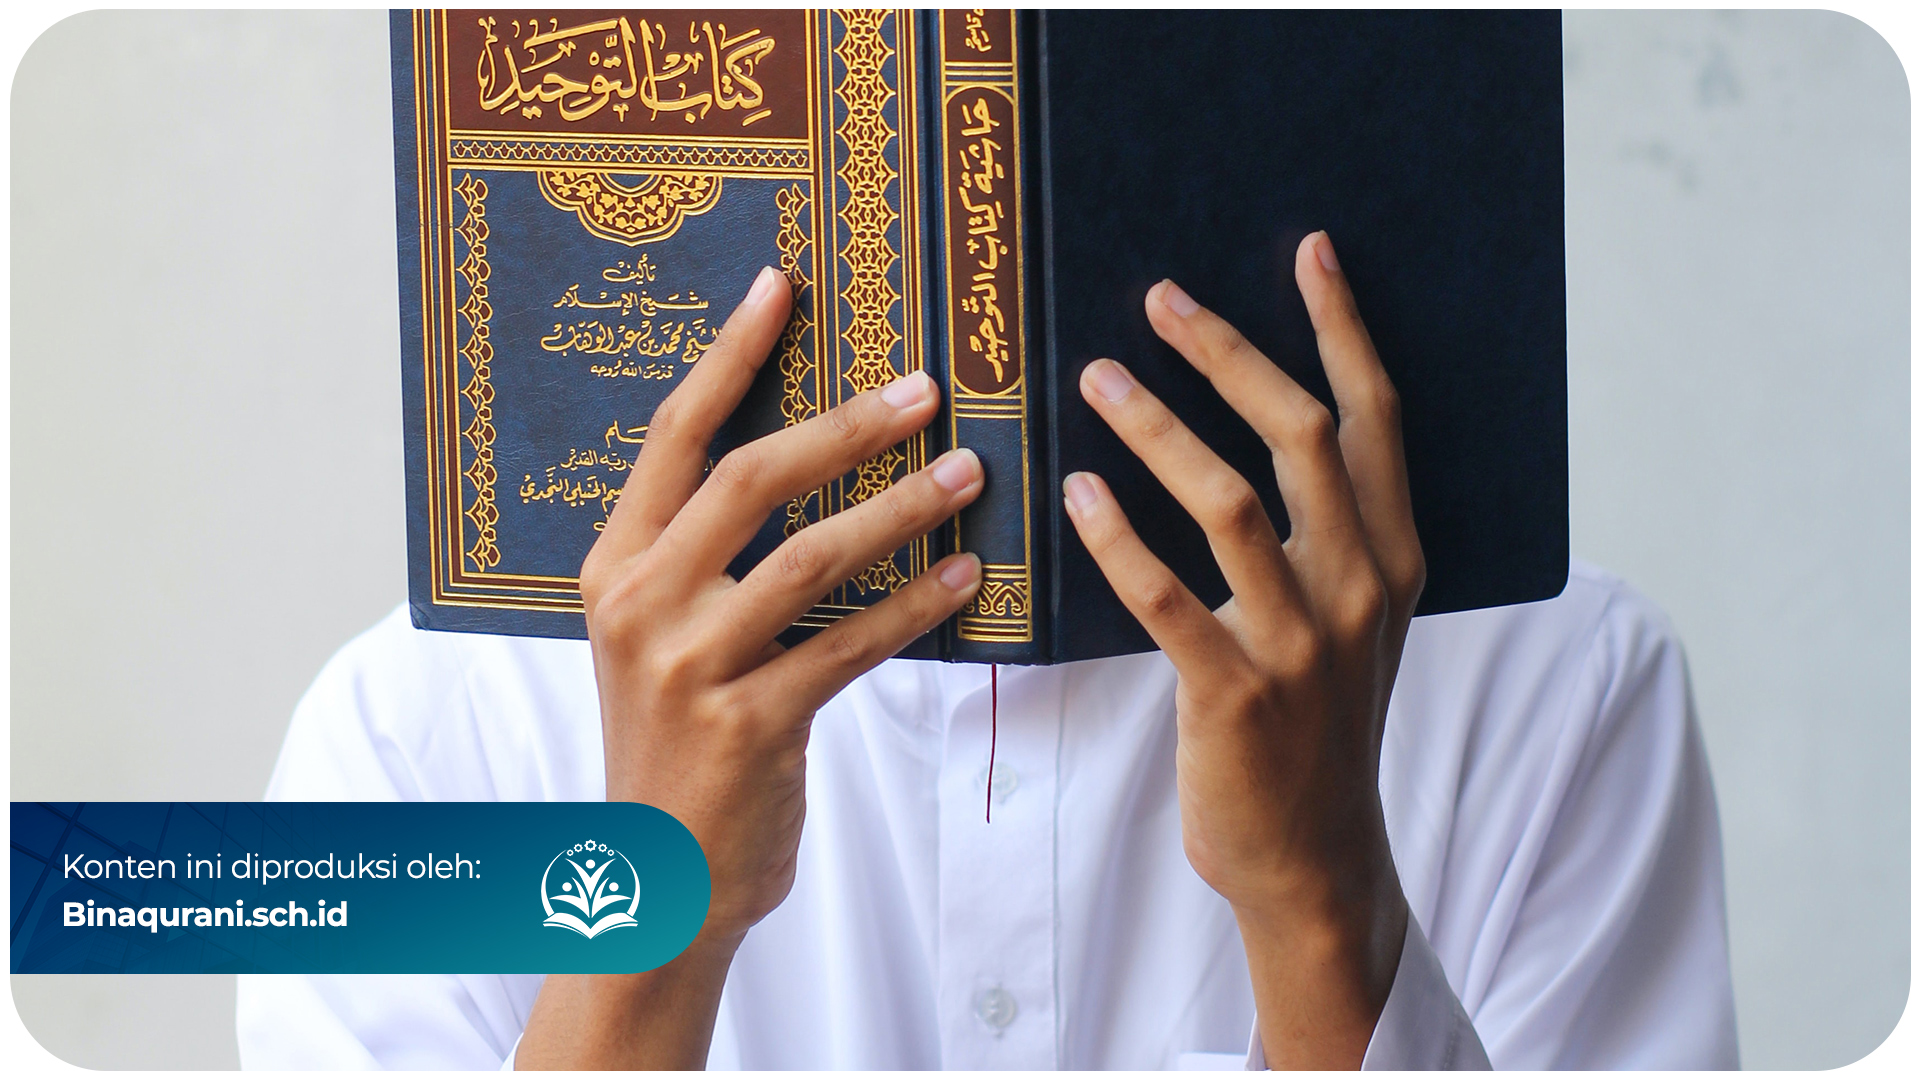 Thumbnail-Bina-Qurani-Insan-Cendekia